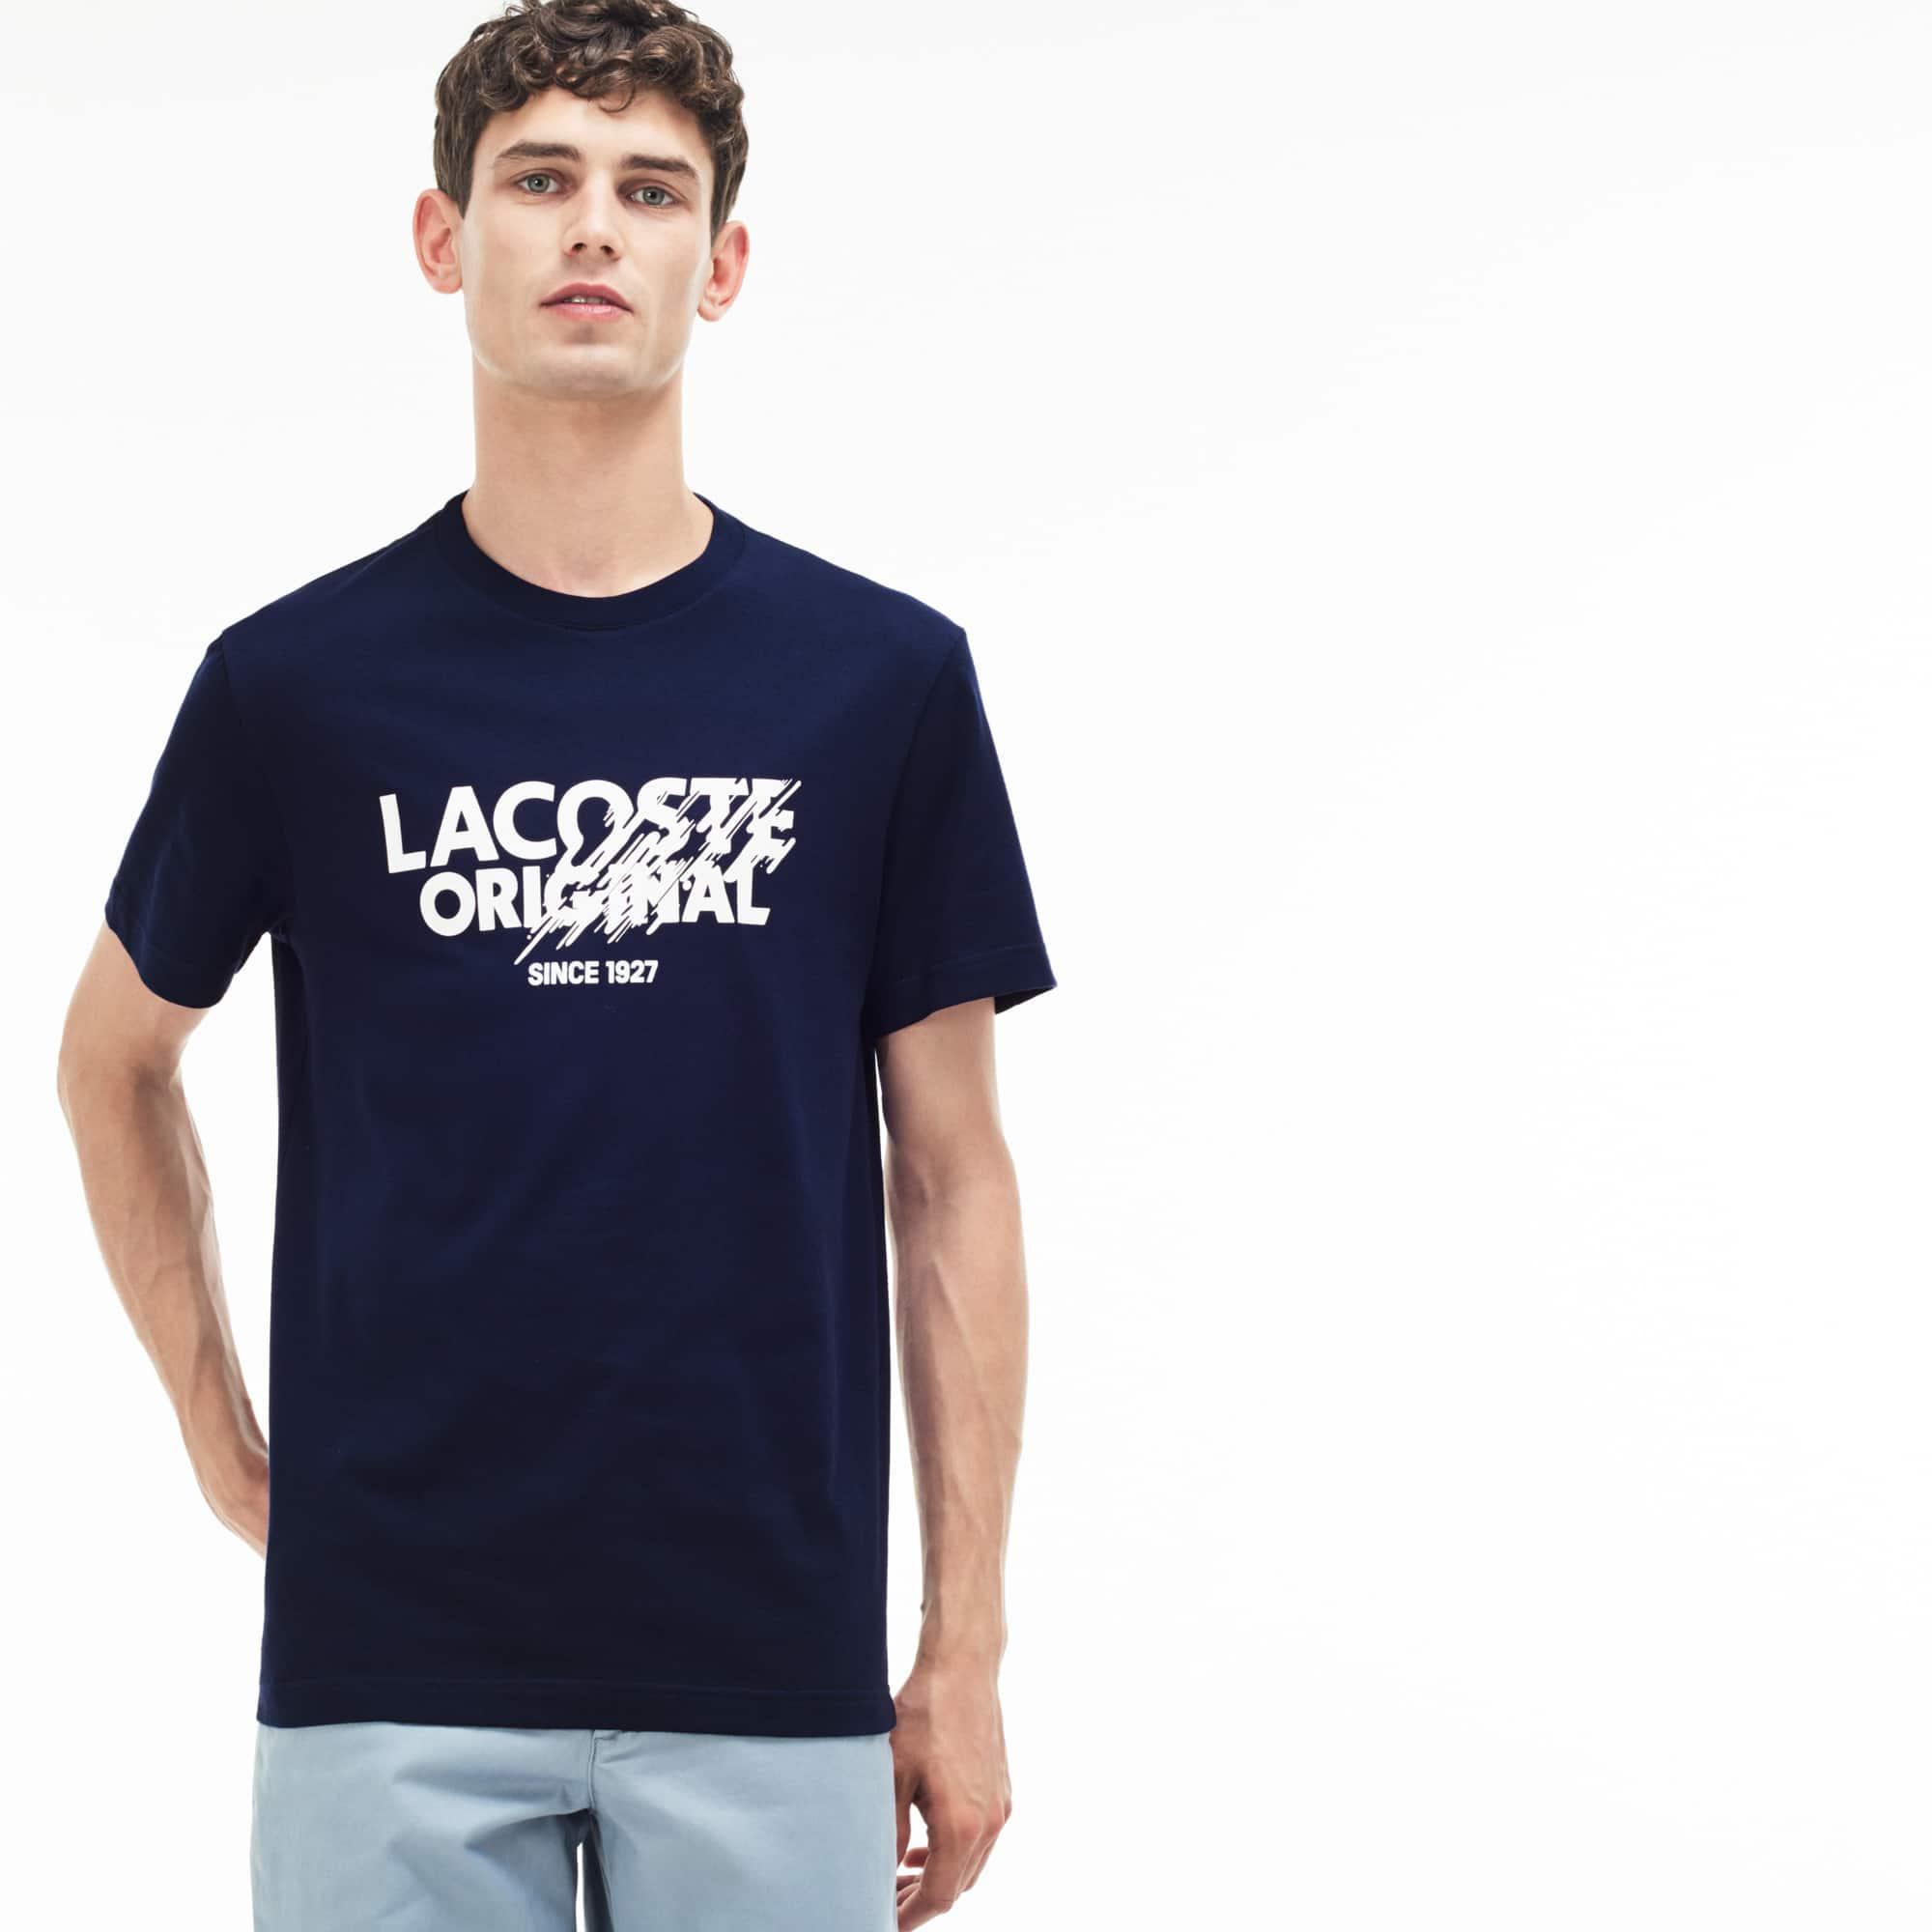 Men's Crew Neck Lacoste Original Branded Jersey T-shirt